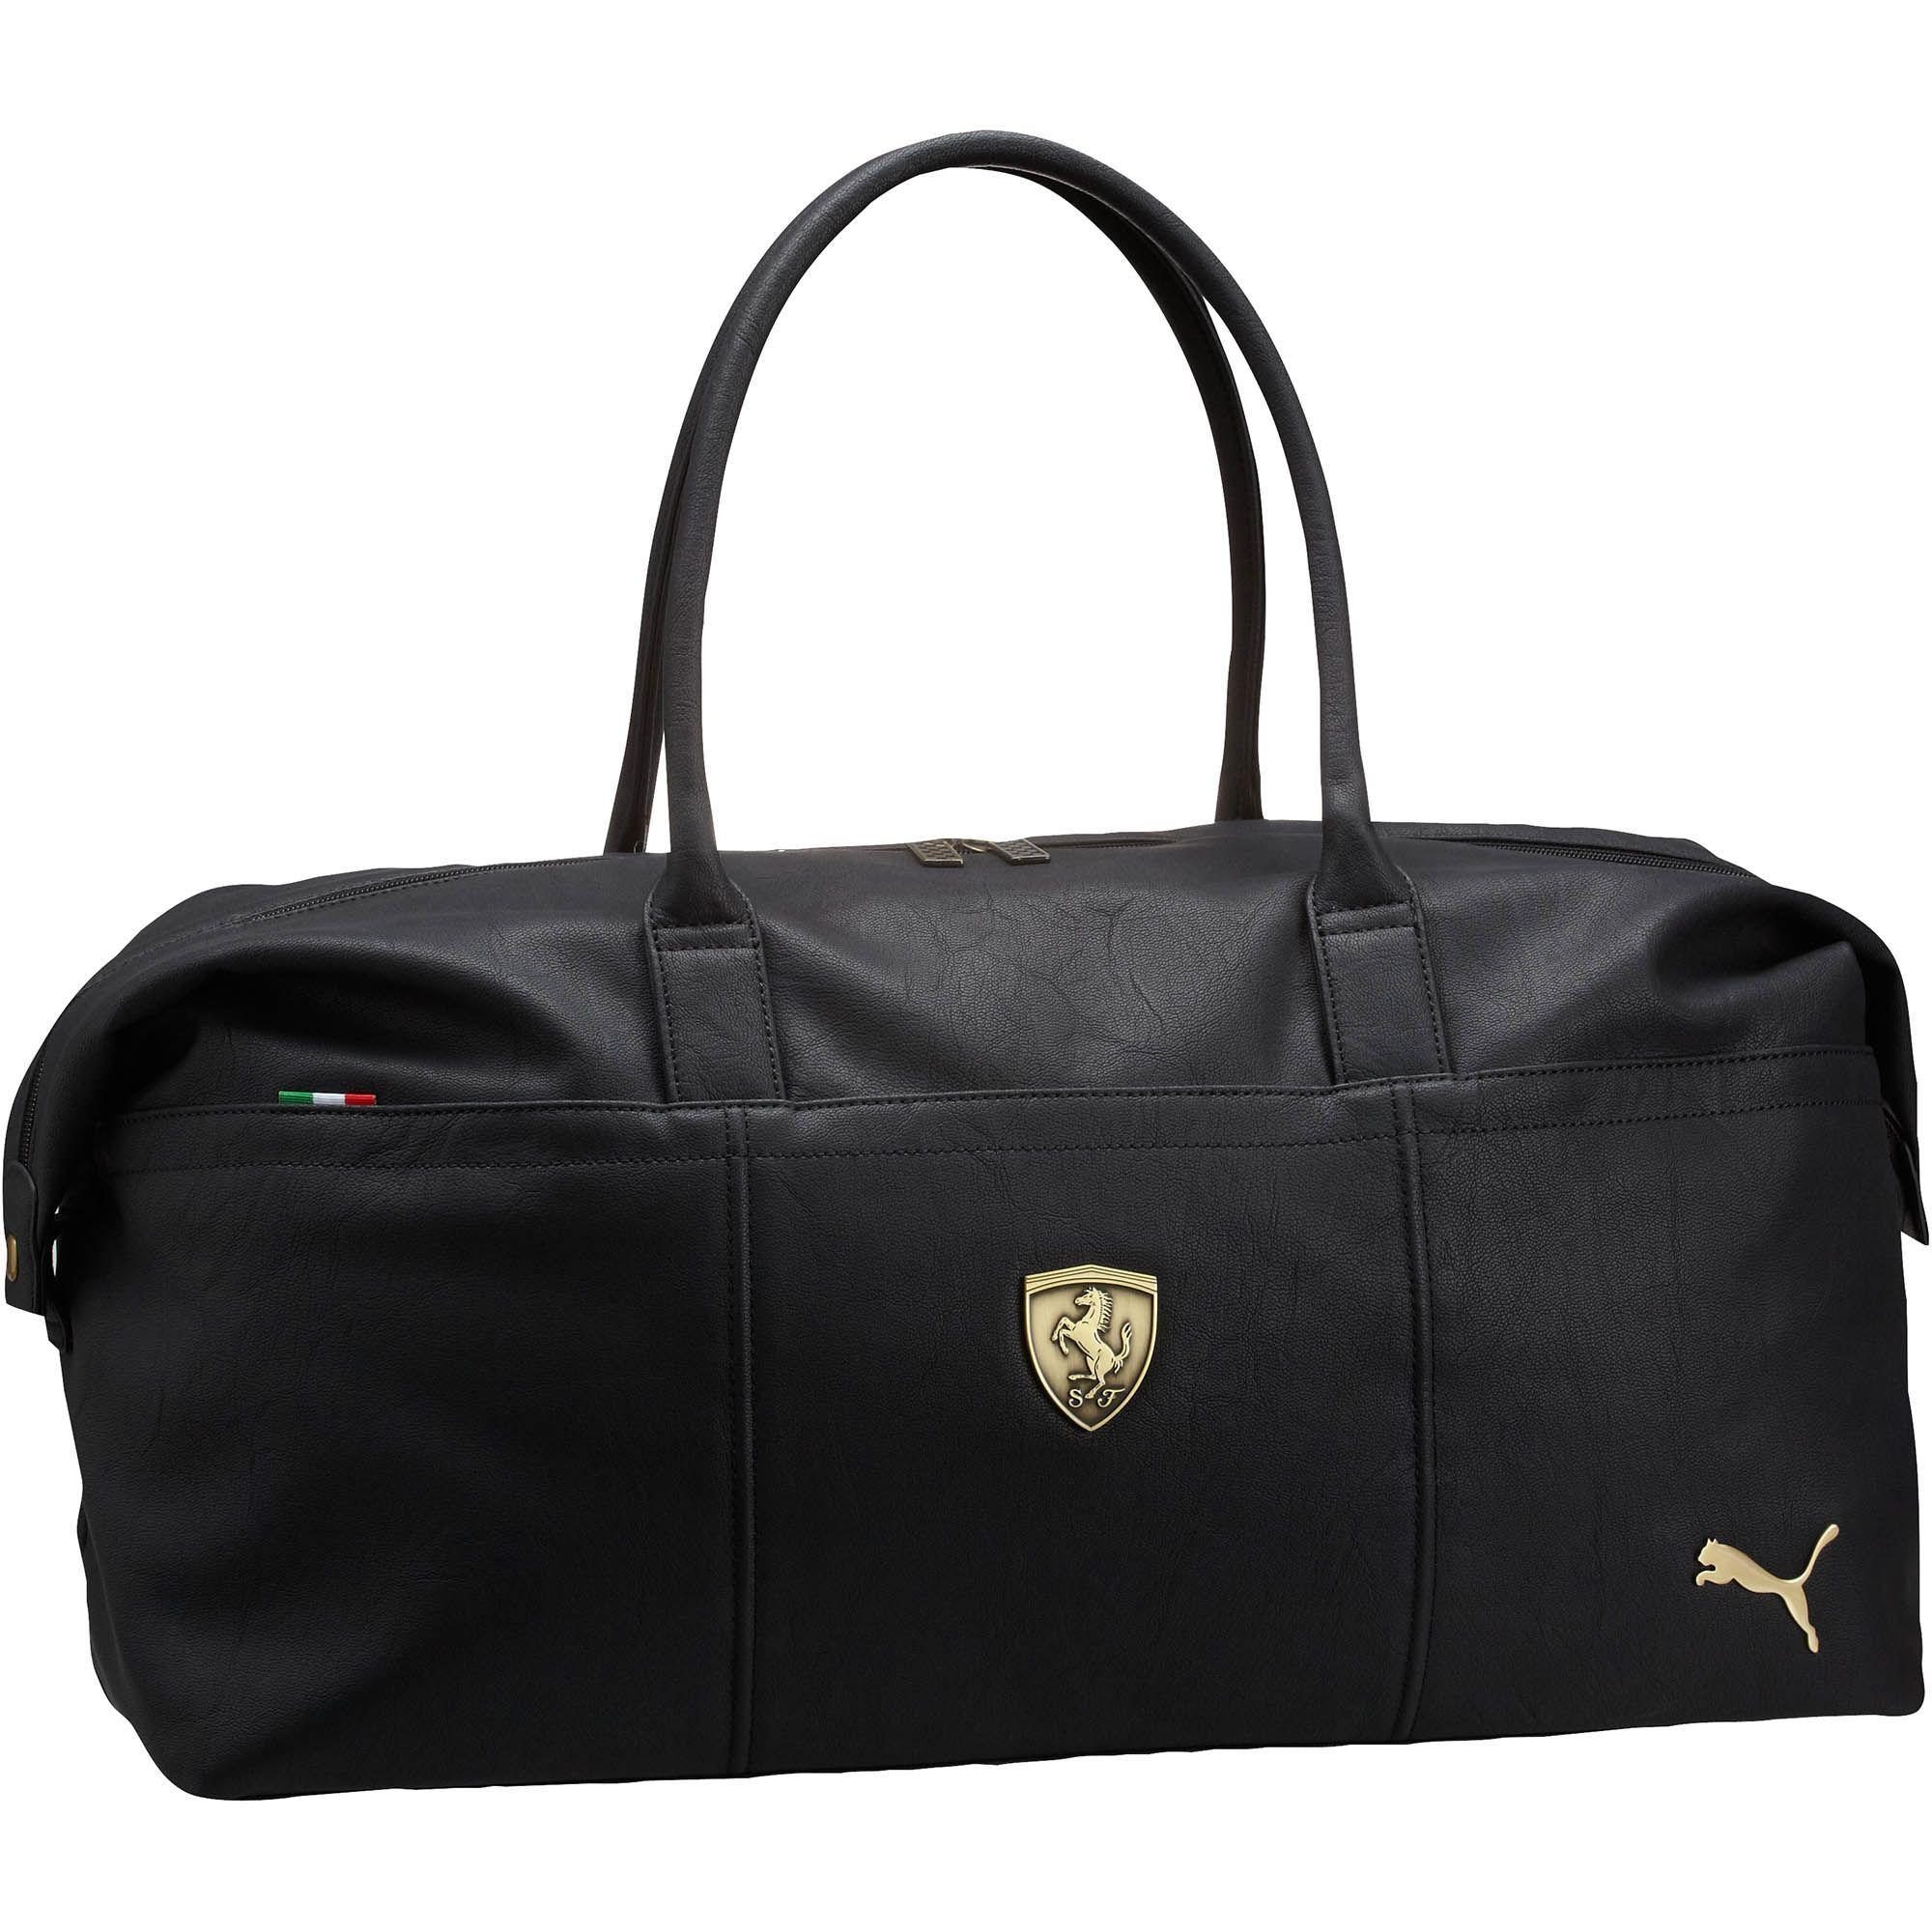 PUMA Ferrari Weekender Bag | - from the official Puma® Online Store